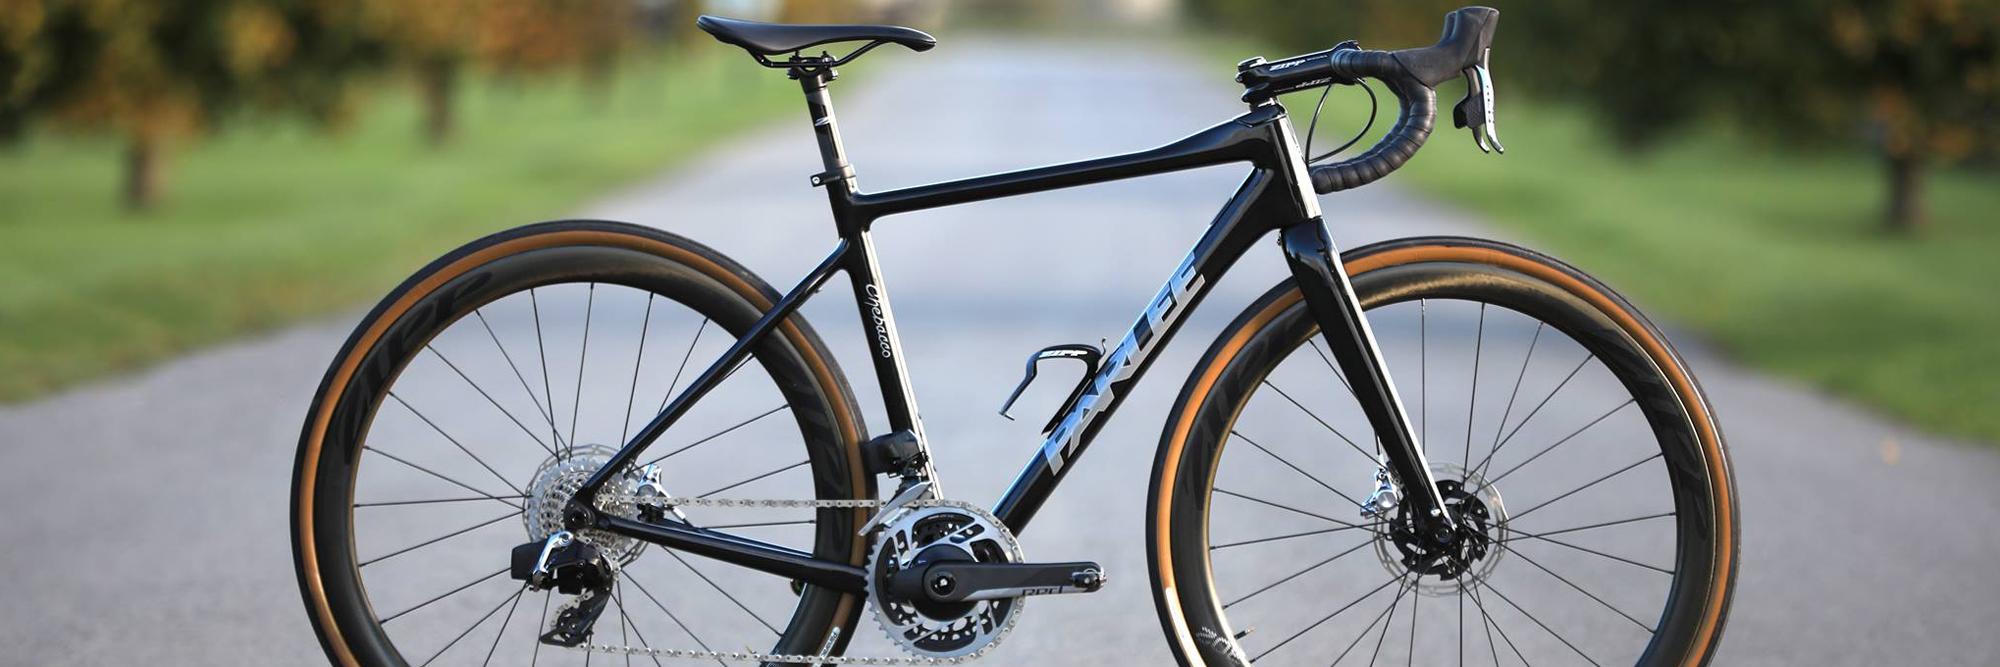 Parlee Cycles at Spark Bike Run Sports